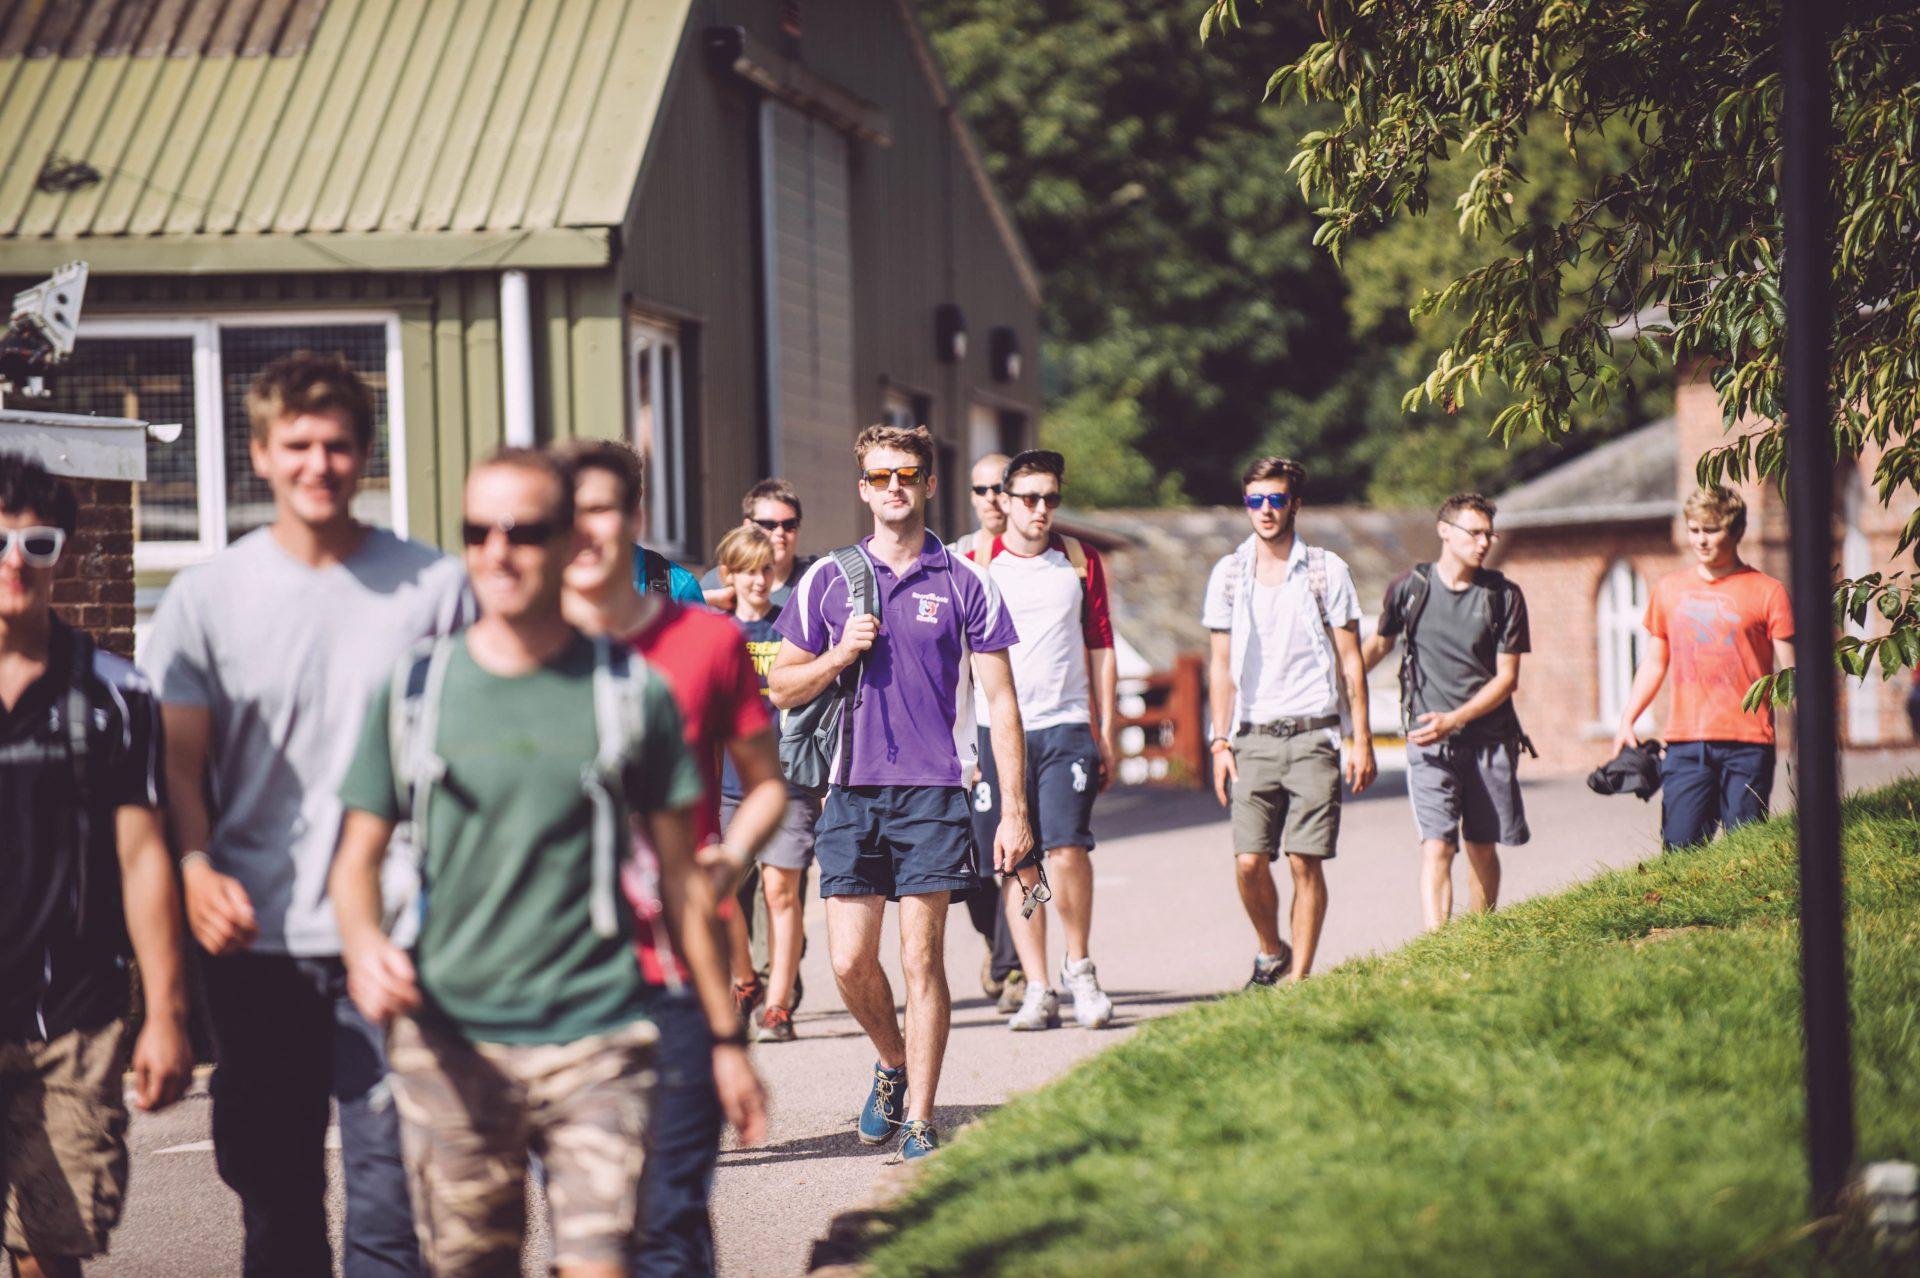 Bicton College students walking around campus